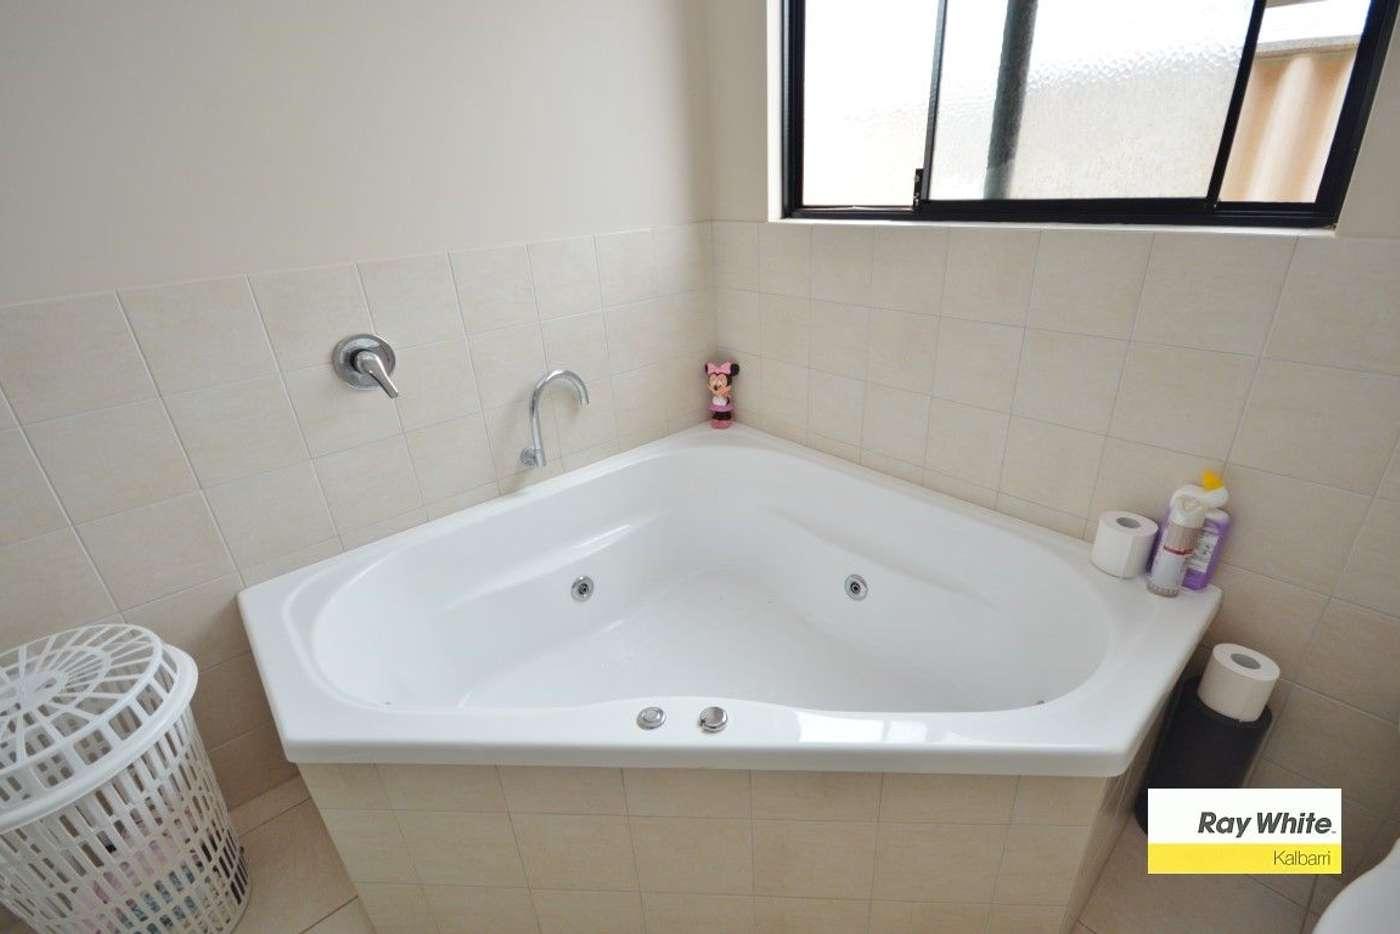 Seventh view of Homely house listing, 20 Waitzia Way, Kalbarri WA 6536